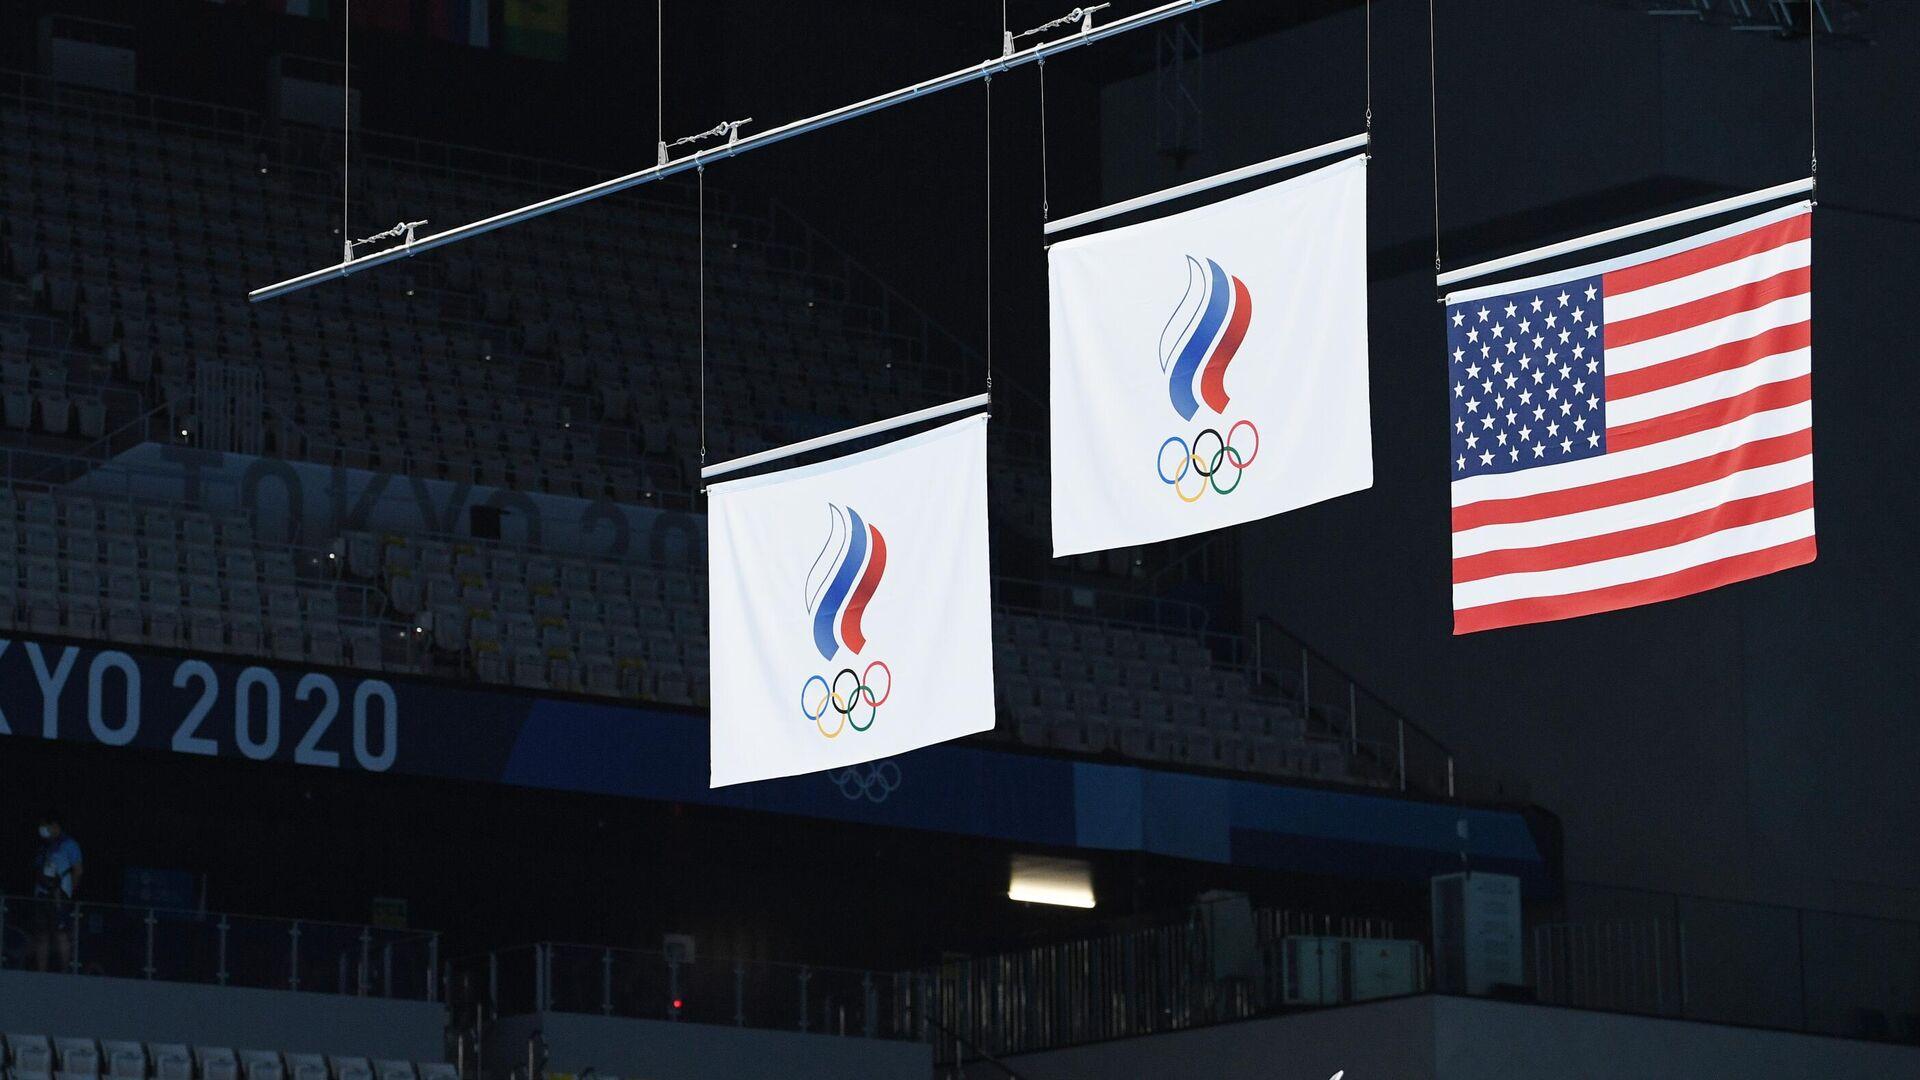 Флаги Олимпийского комитета России и США - РИА Новости, 1920, 27.07.2021